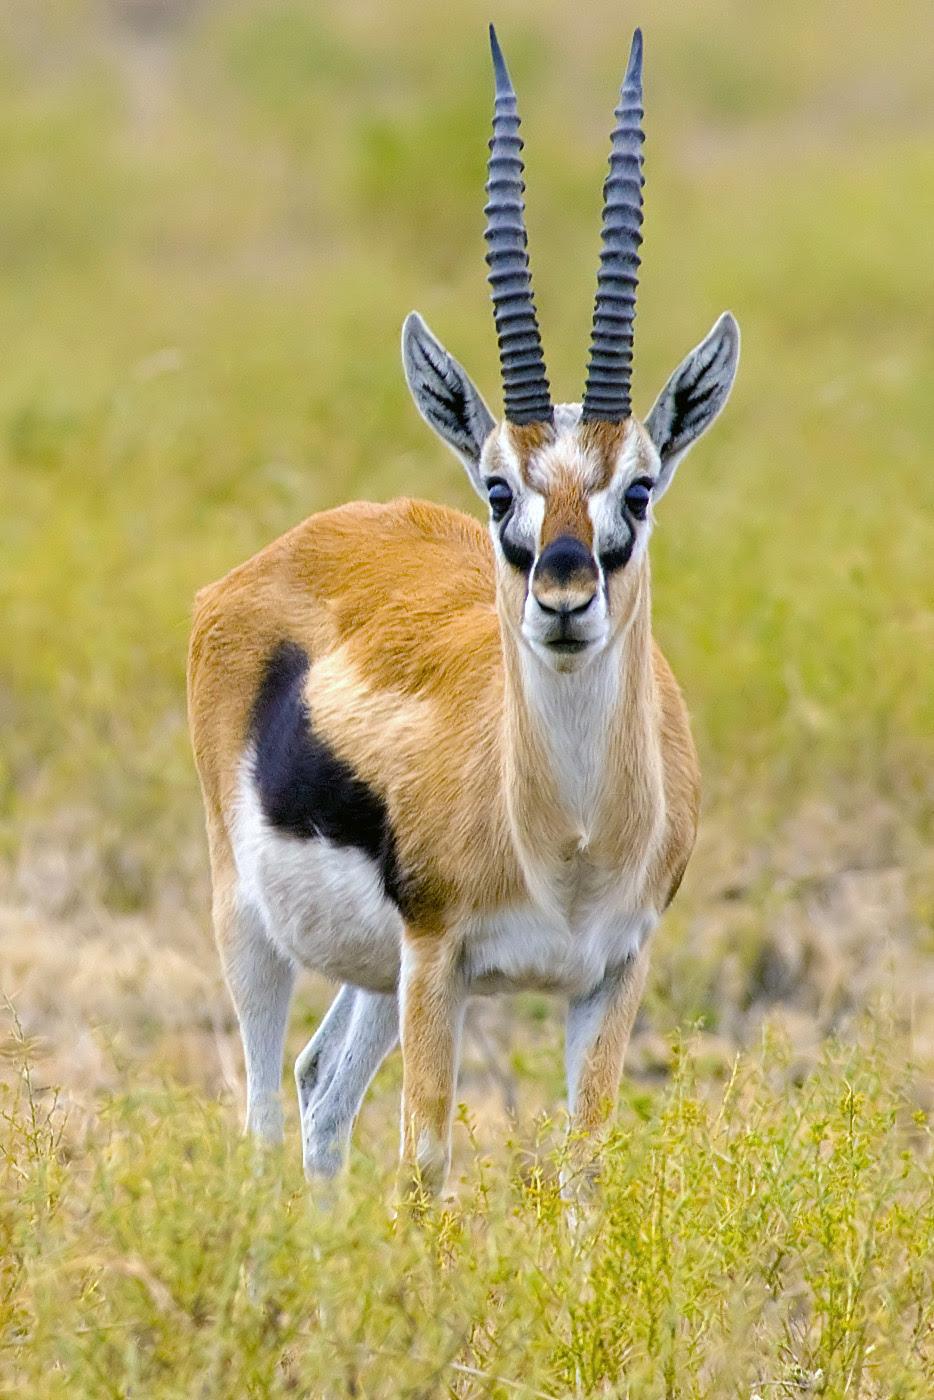 GACELA DE THOMSON Gazella thomsonii